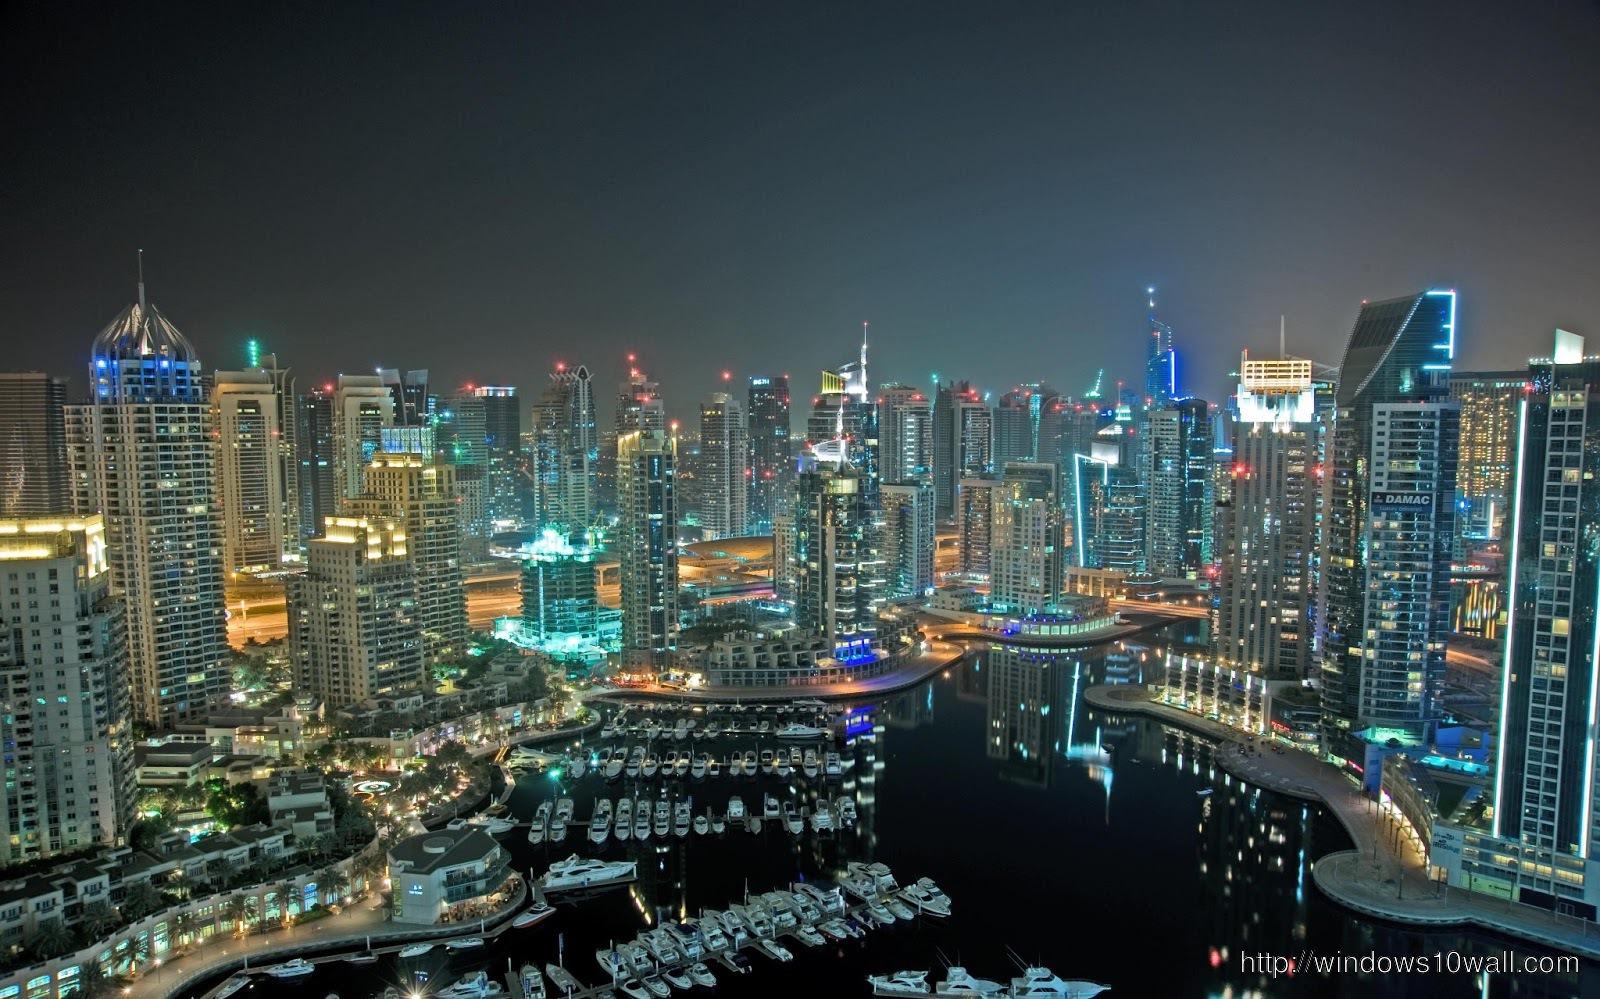 Dubai Hd Free Download Wallpaper Windows 10 Wallpapers